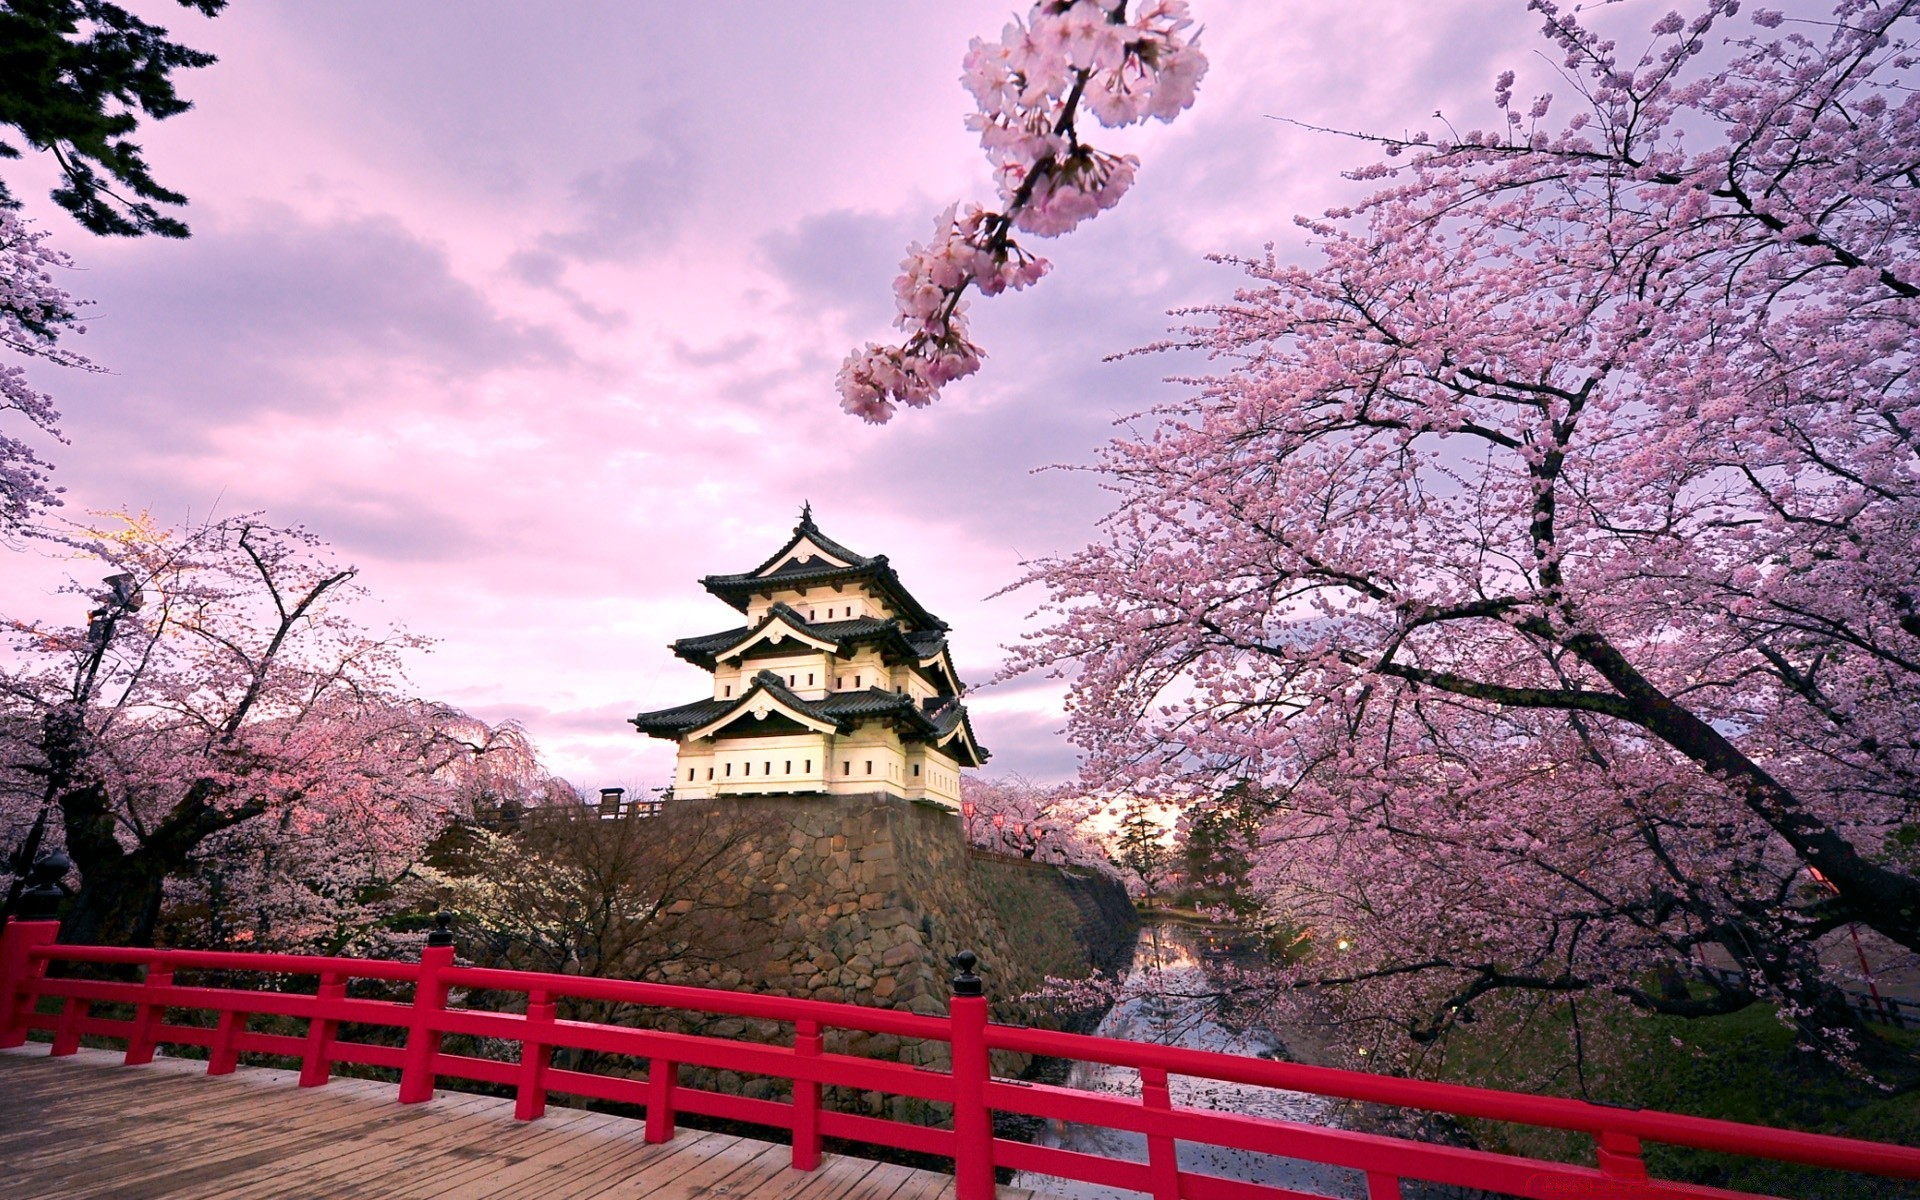 Osaka japan pics, www playboynakedgirl